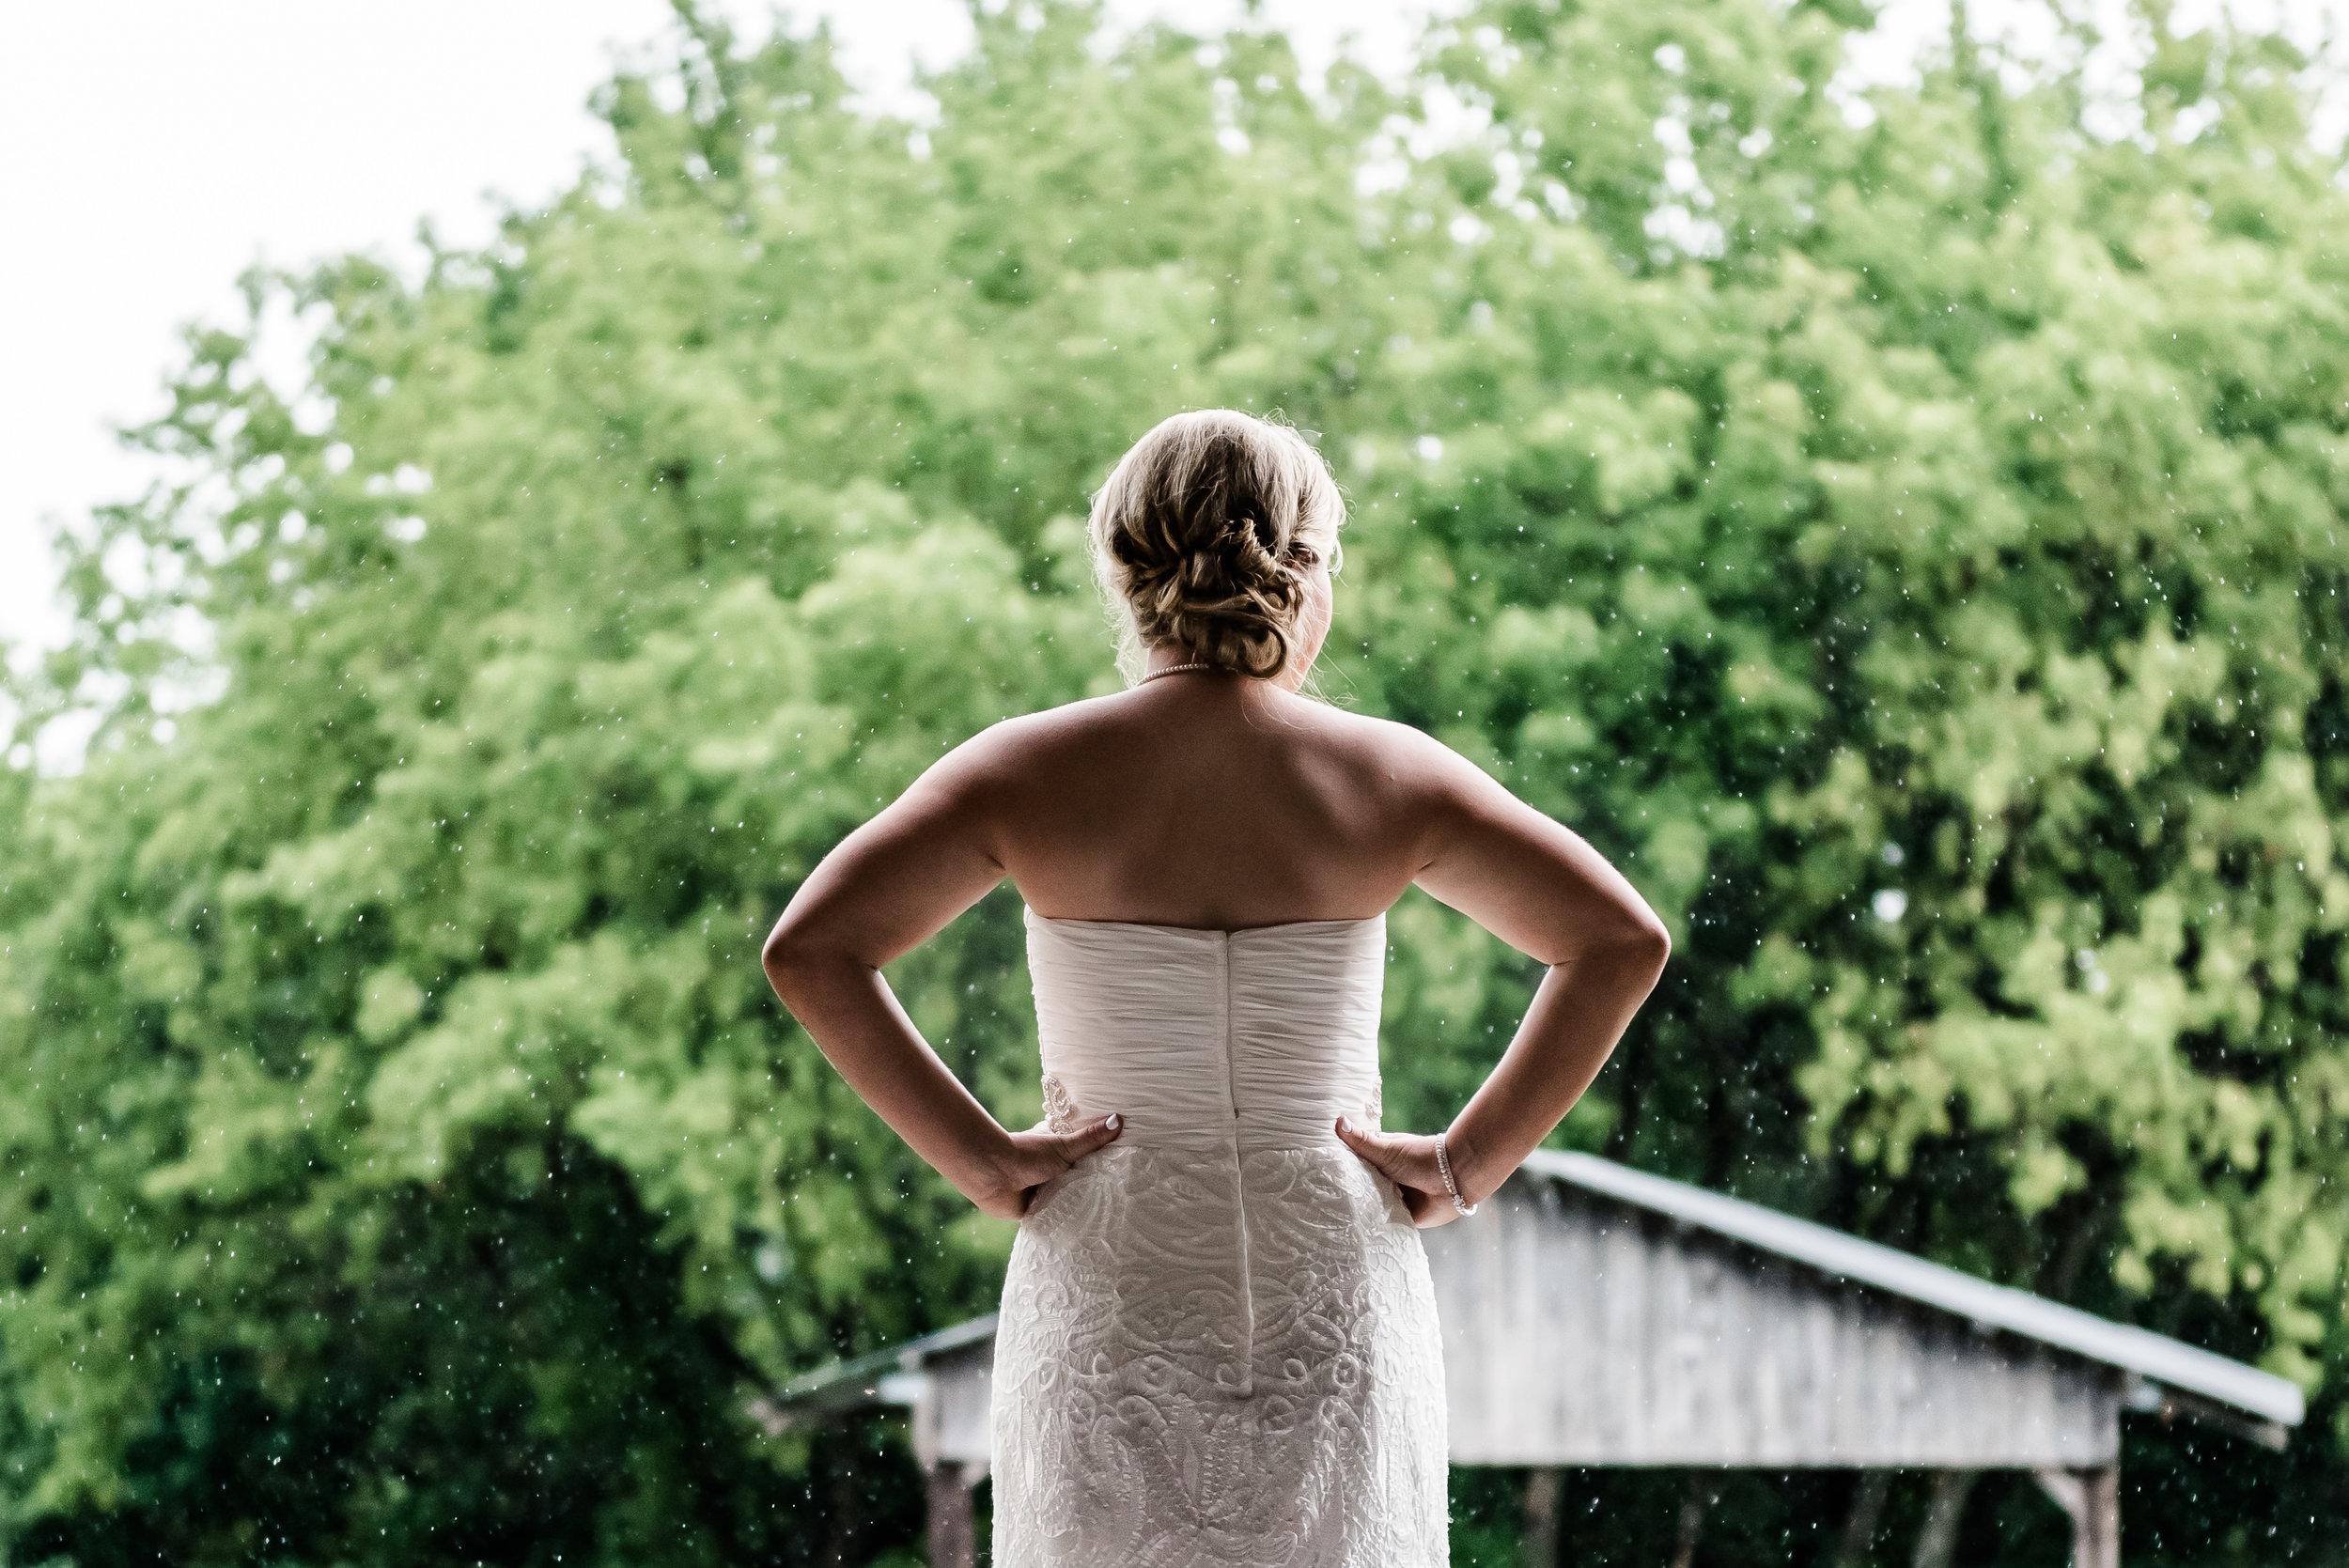 Planning an Outdoor Wedding - Rainy Wedding Day